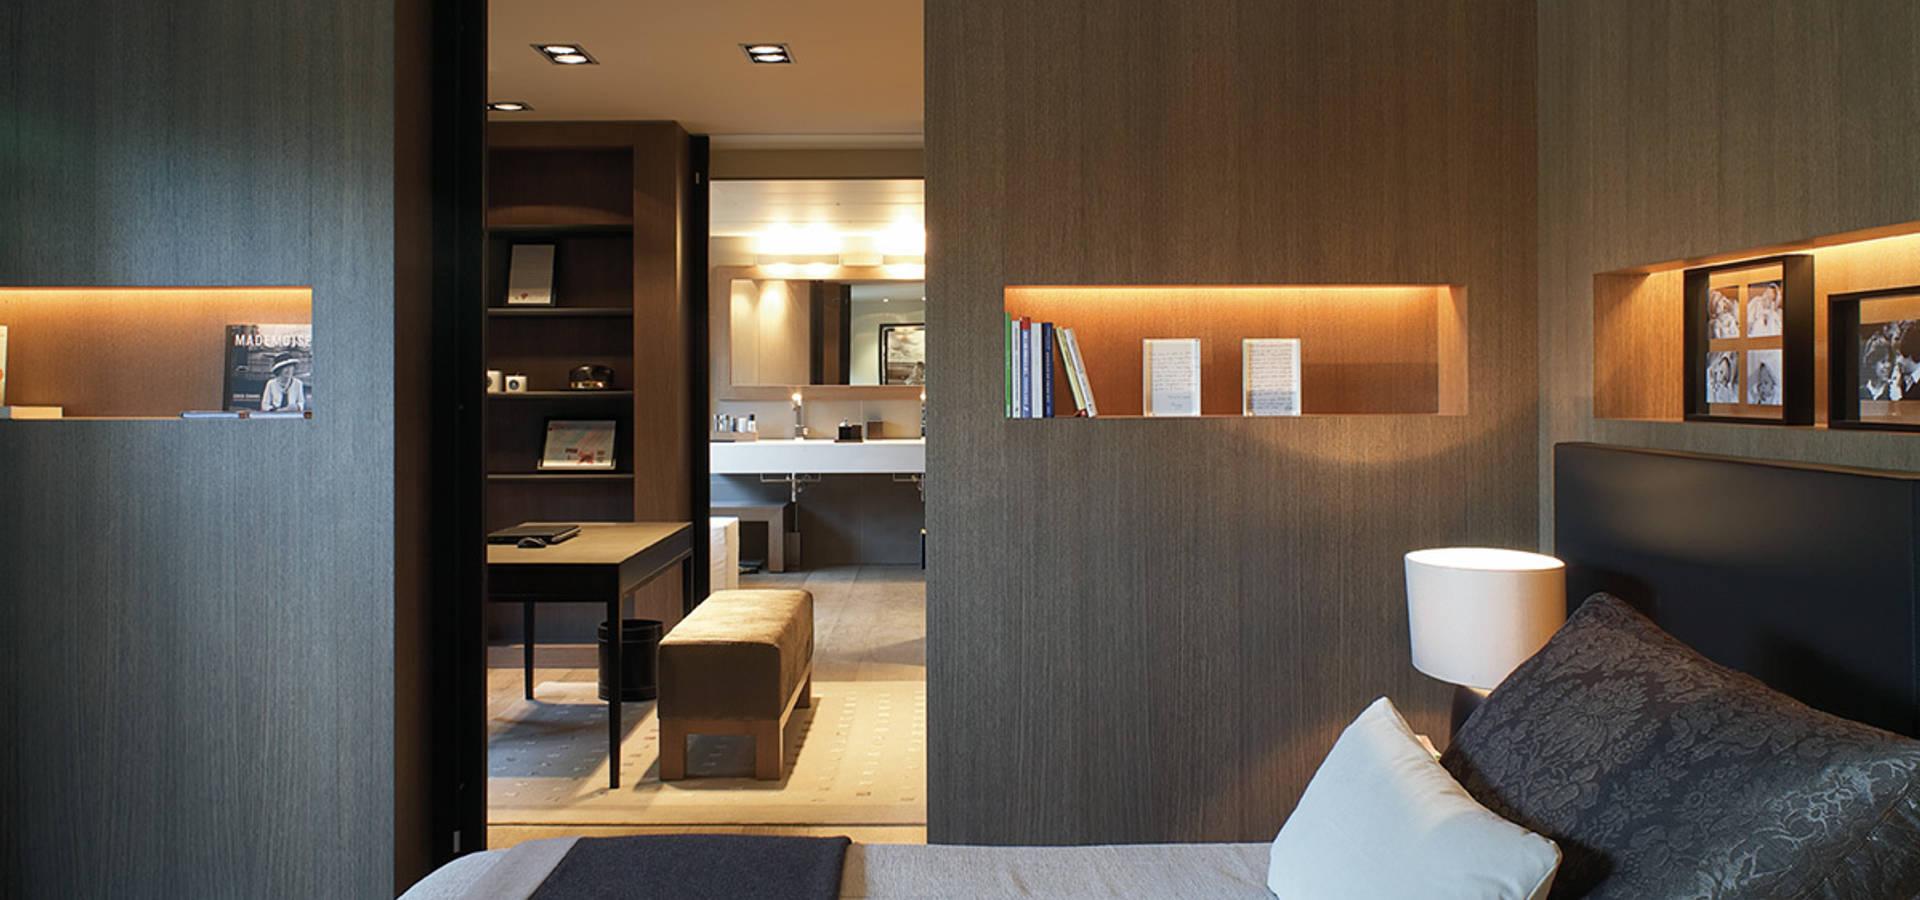 berlin homify online gmbh co kg homify. Black Bedroom Furniture Sets. Home Design Ideas